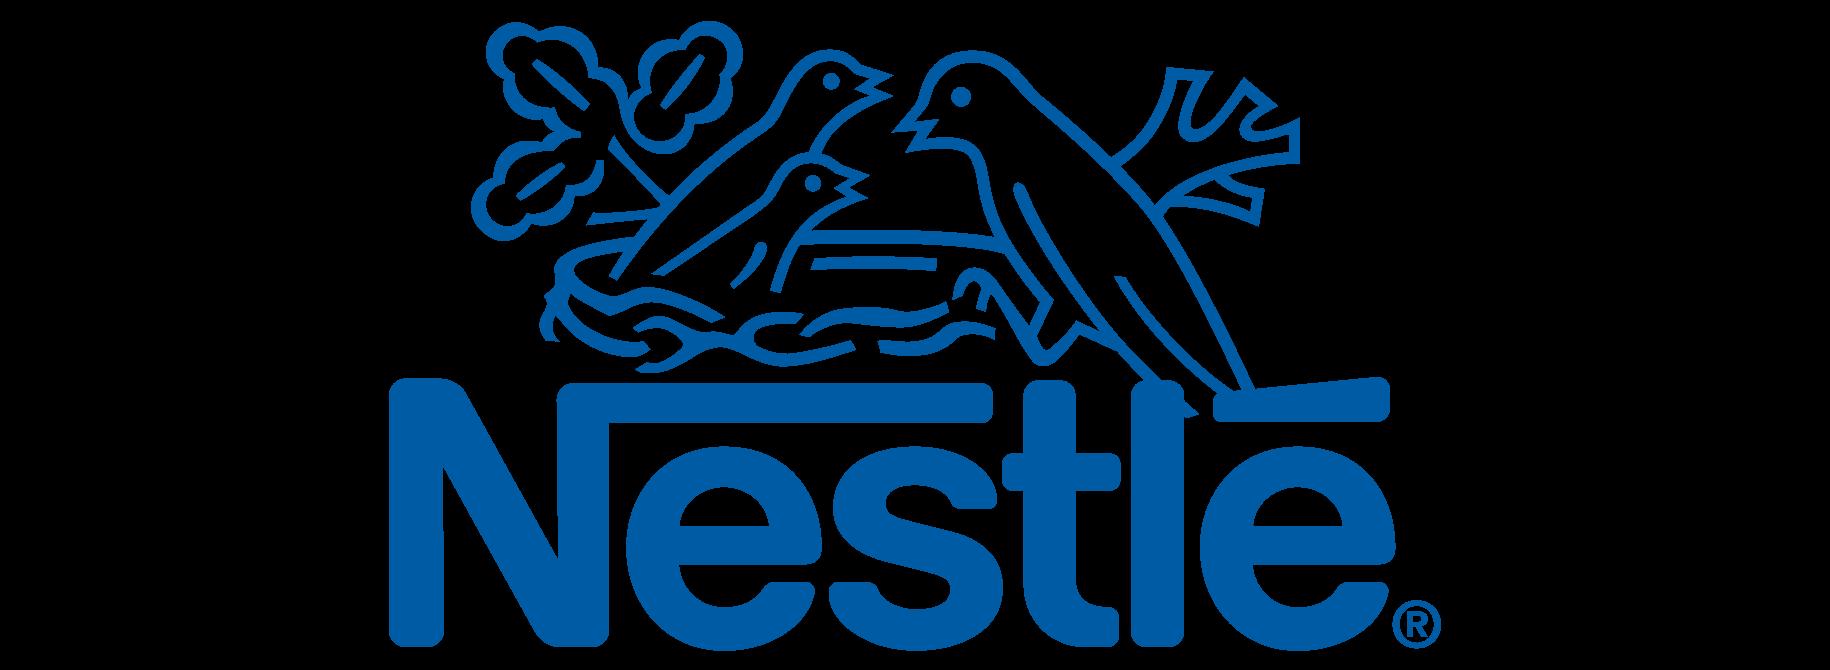 Nestle - Potential - Empower Clients